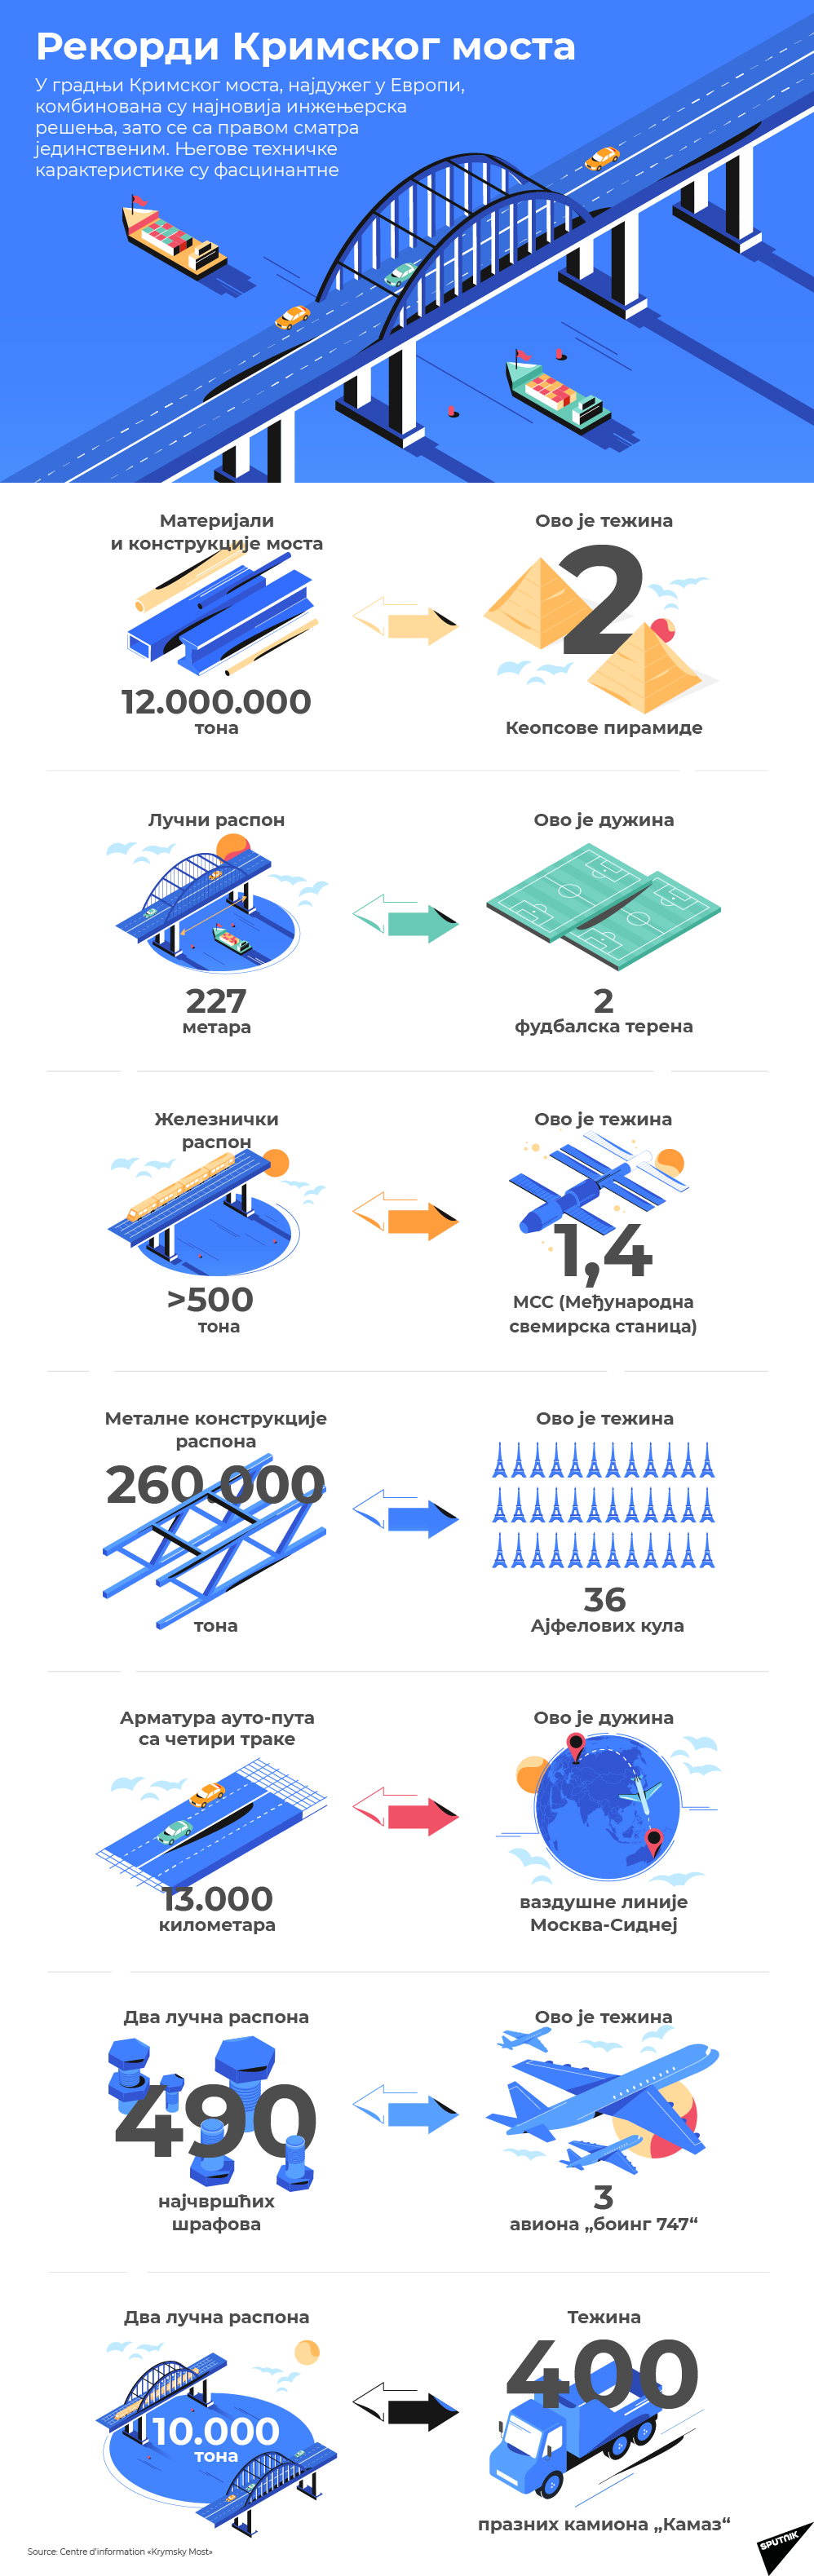 Рекорди Кримског моста - Sputnik Србија